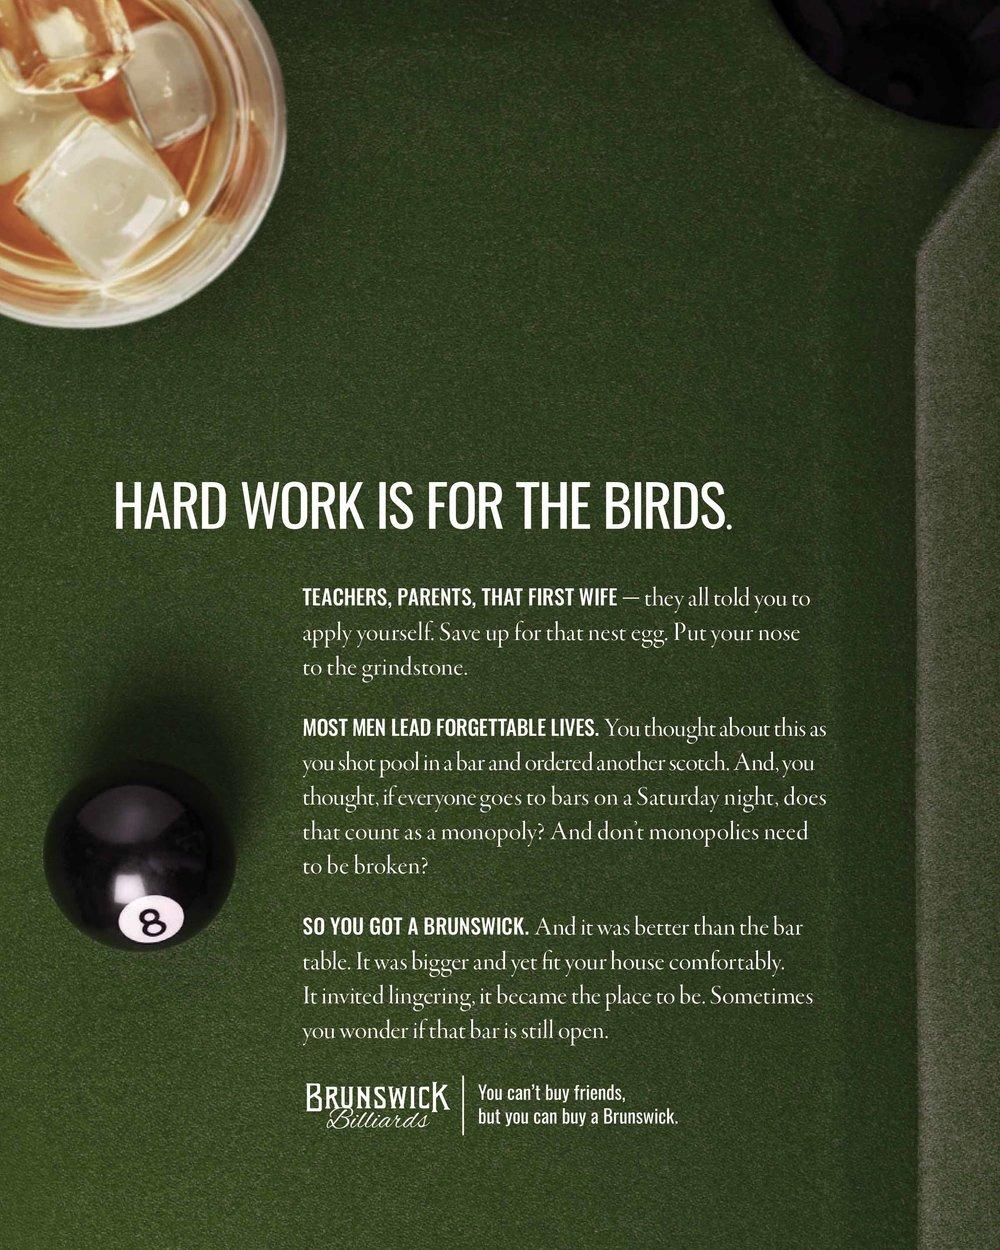 BrunswickBilliards_print-1.jpg